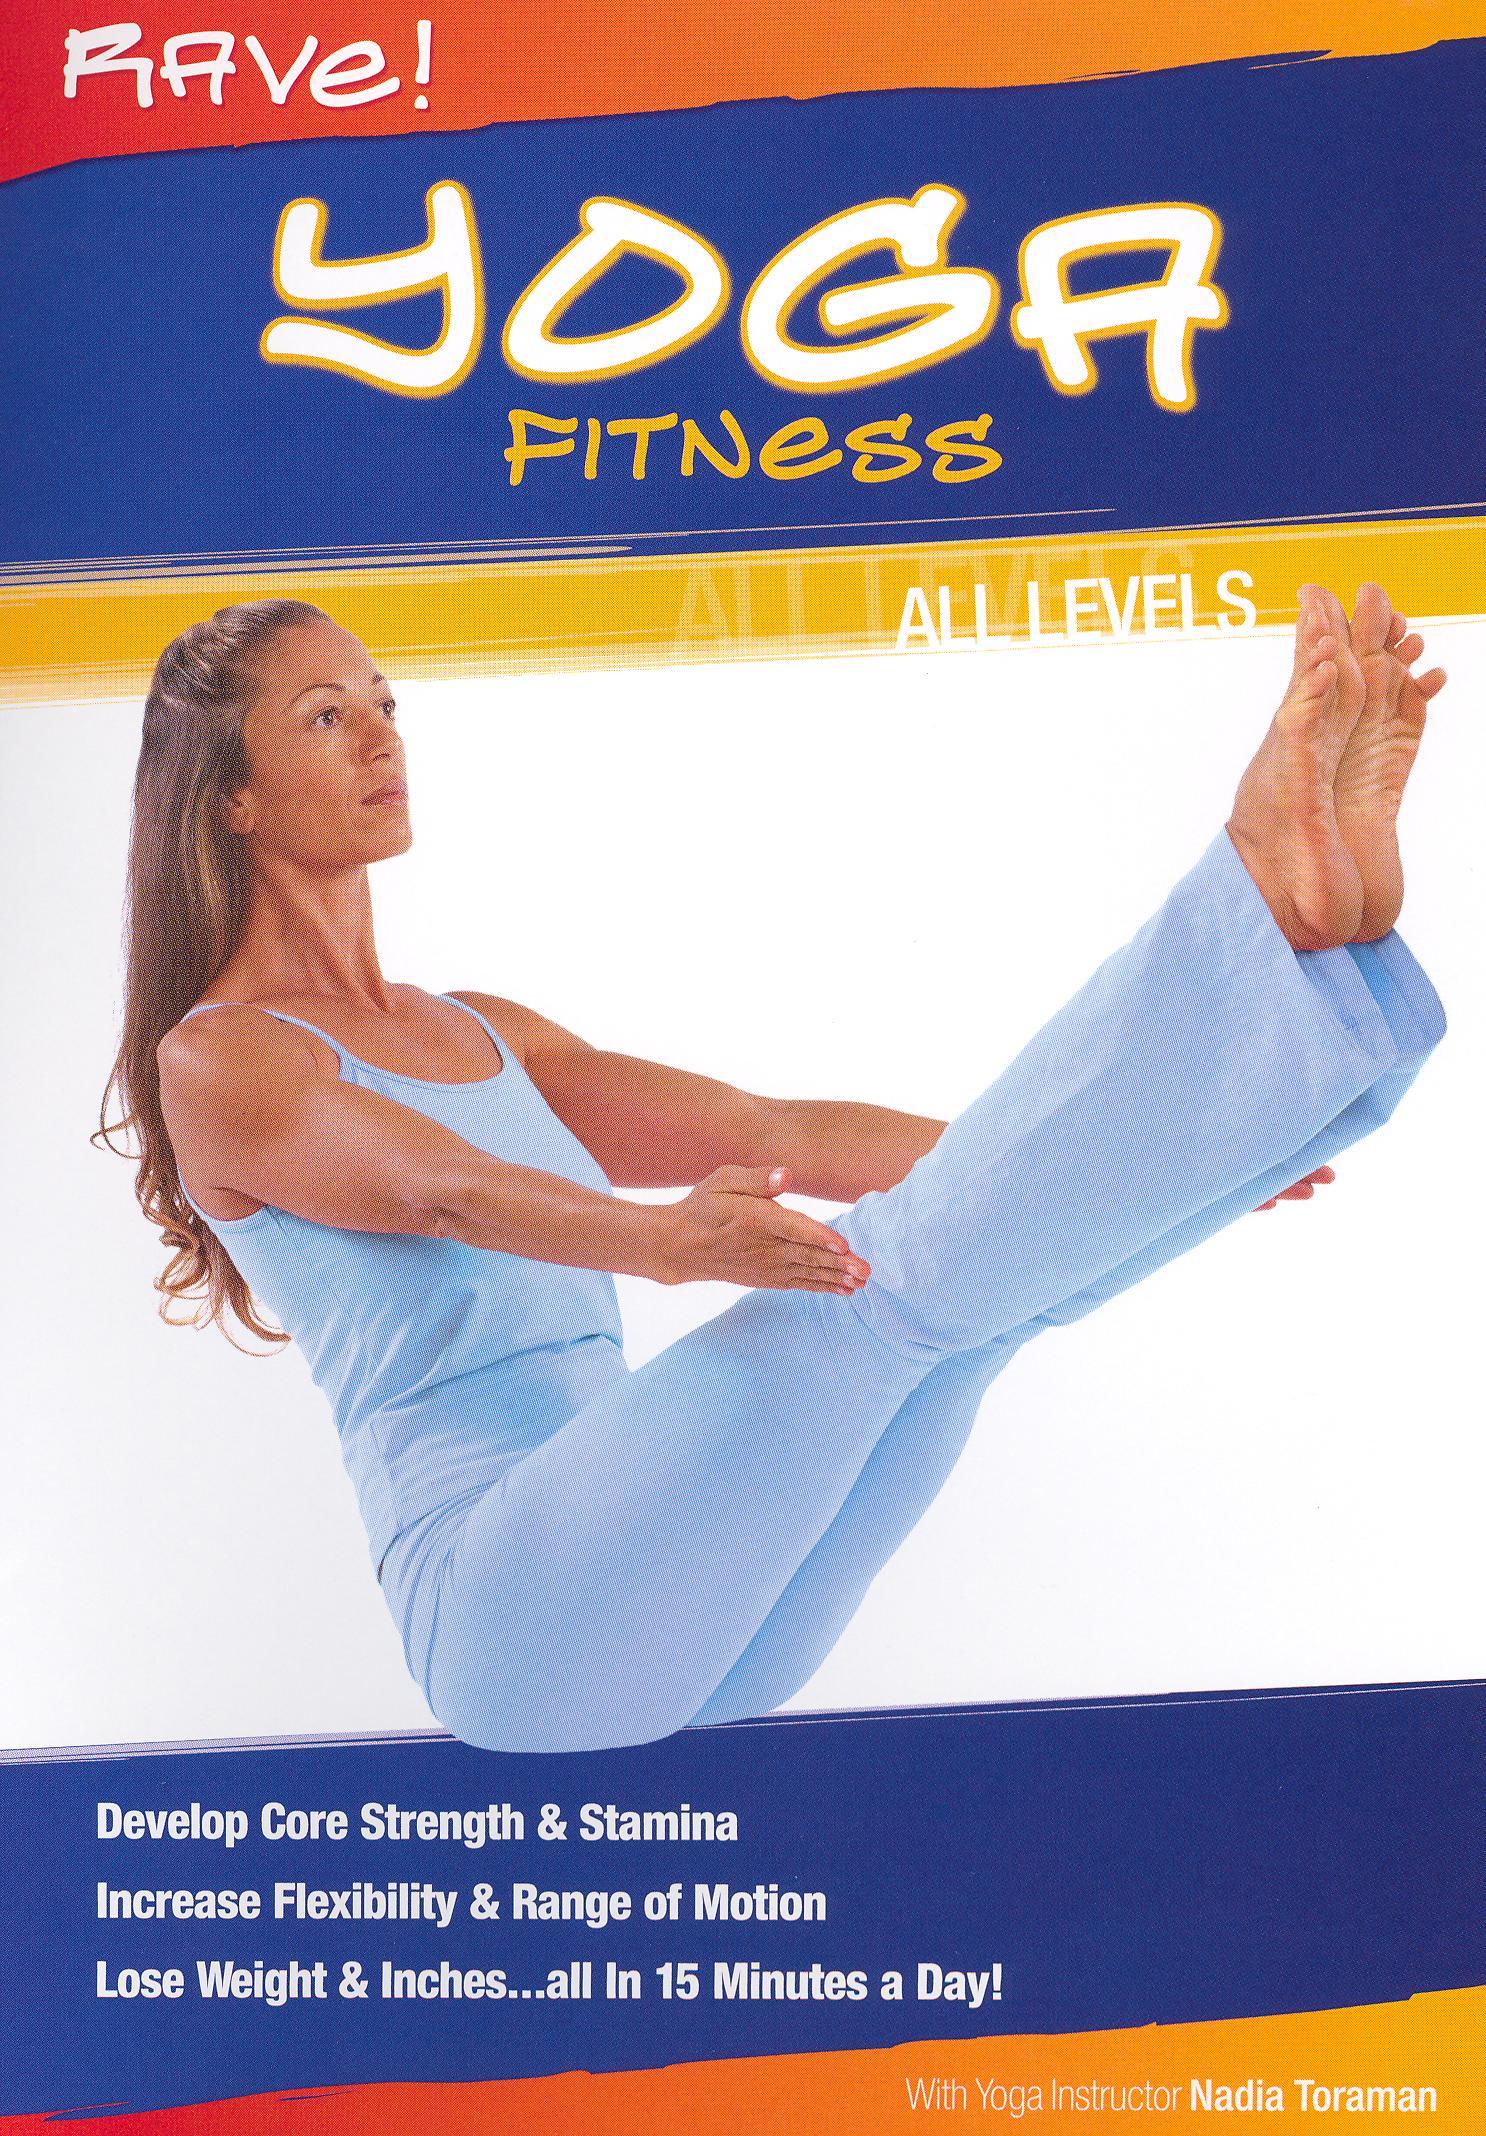 Rave! Yoga Fitness